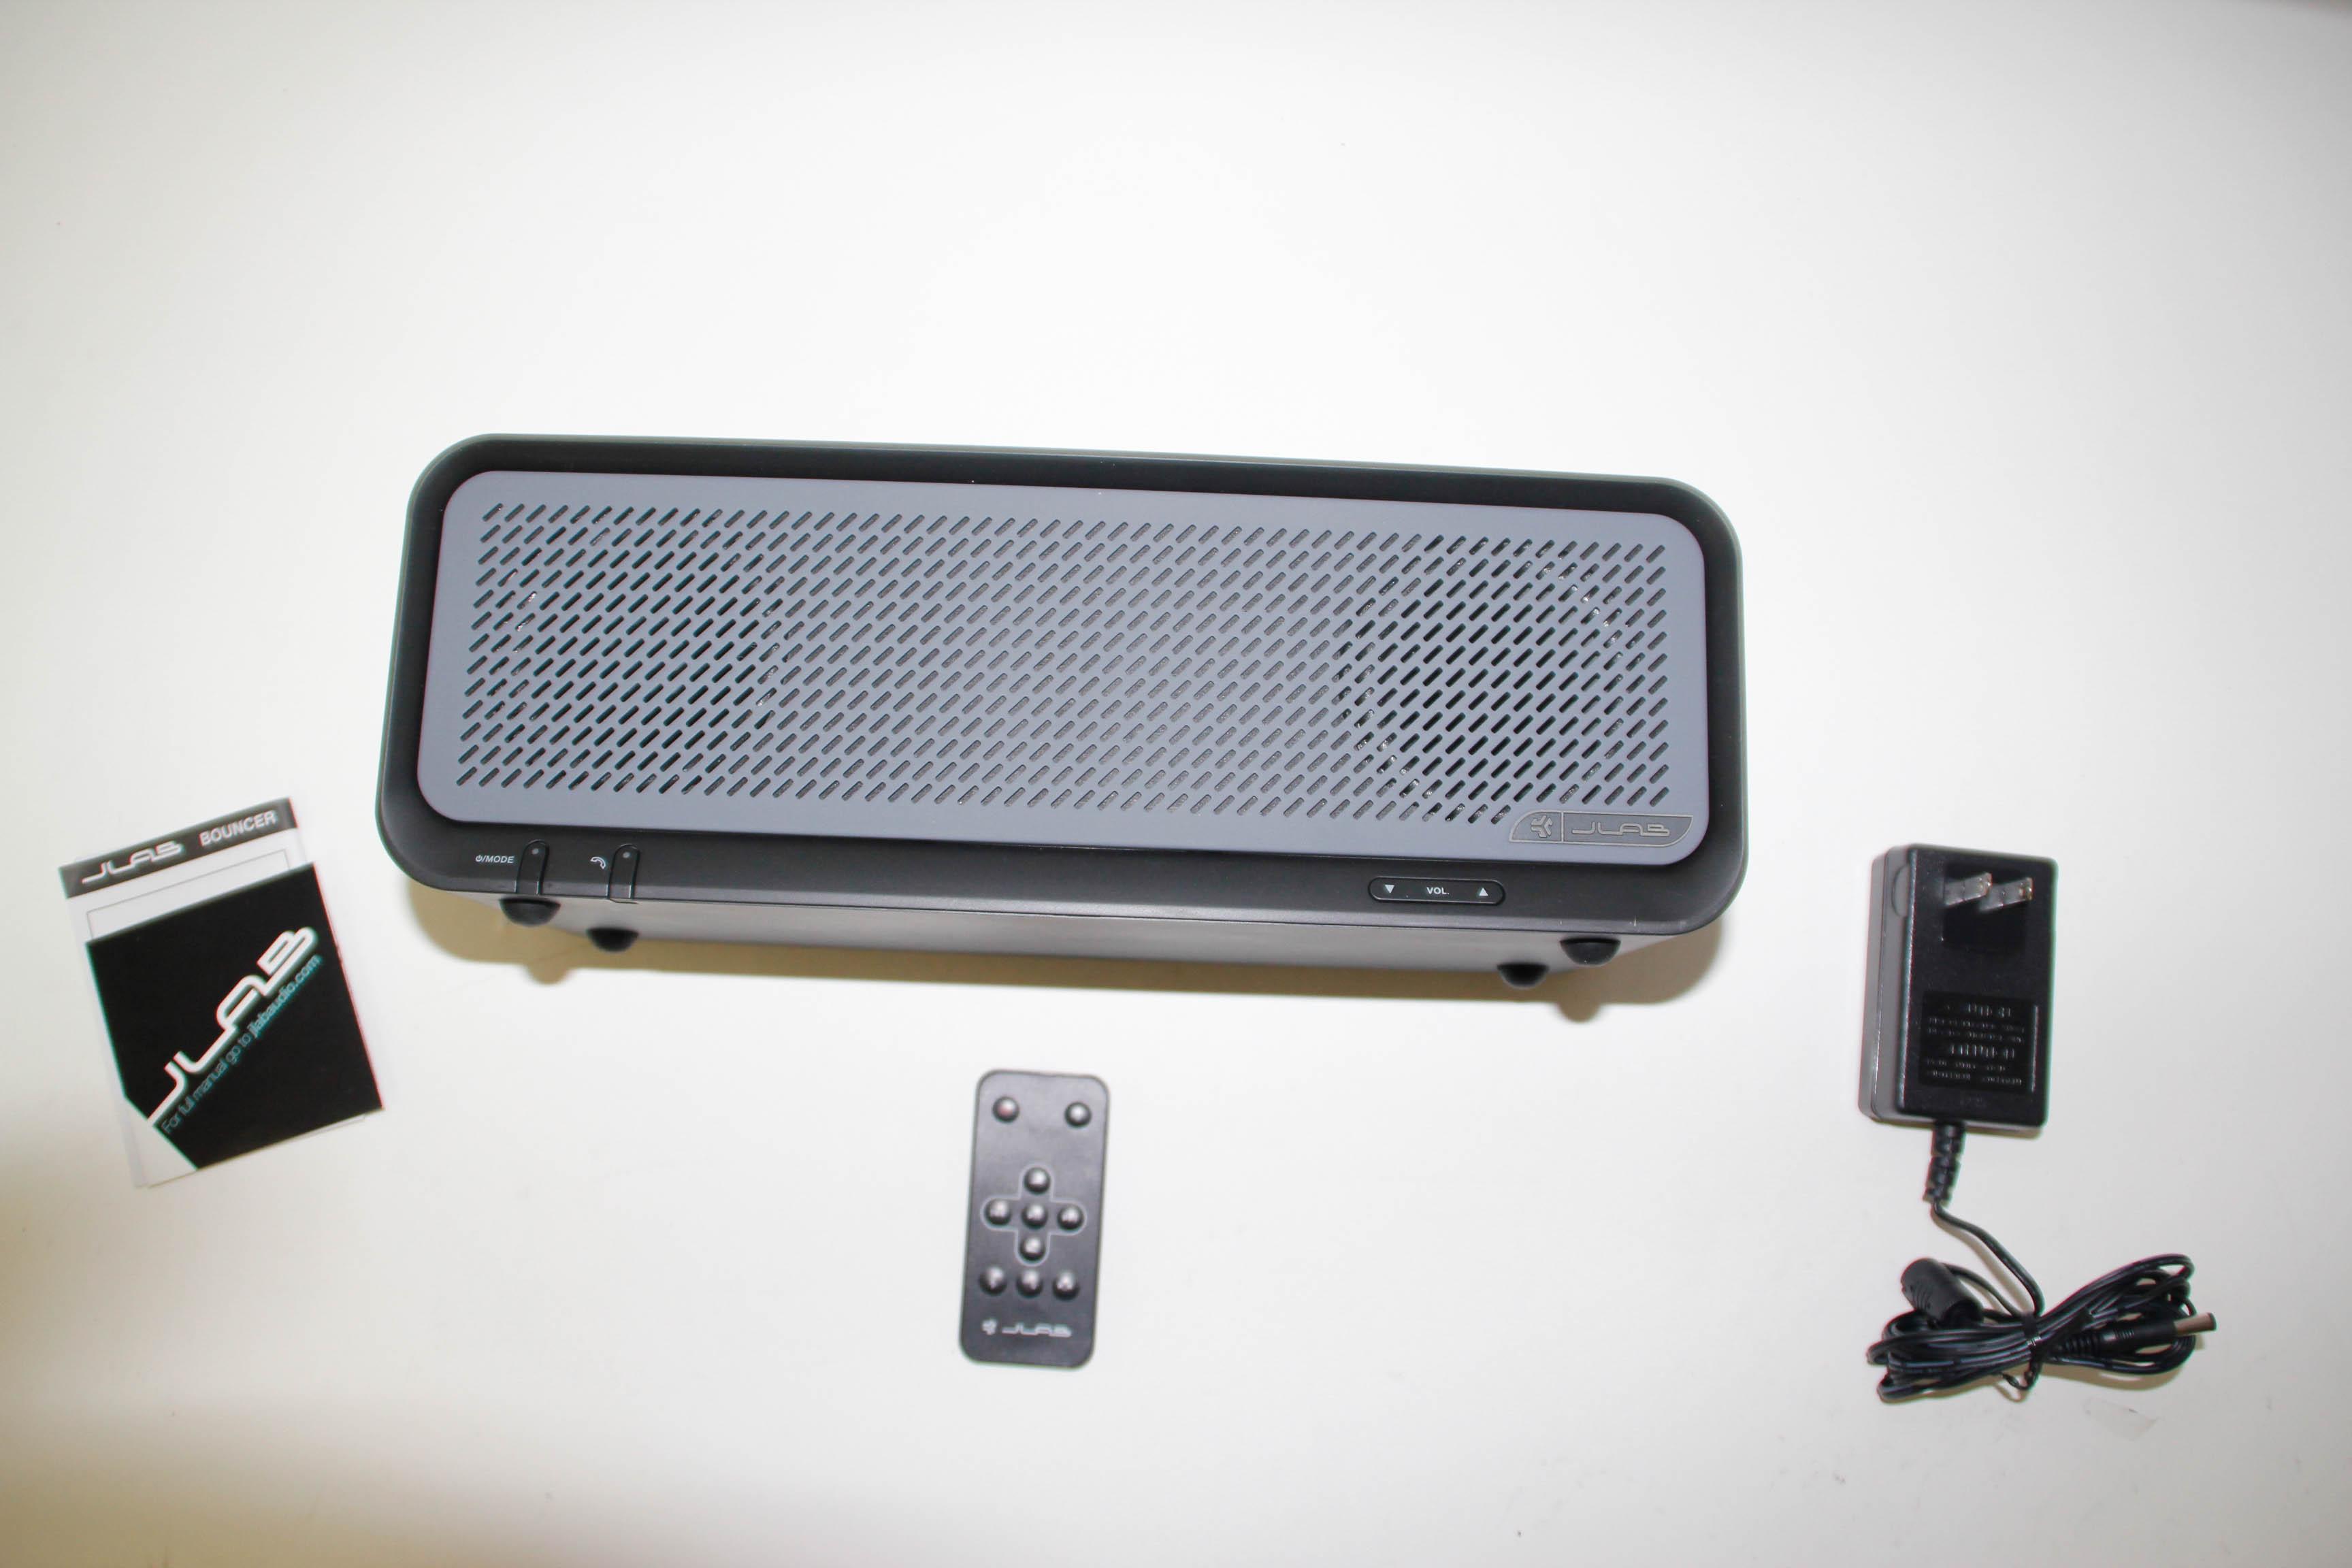 $89.99 - JLab Bouncer Premium Home Bluetooth Speaker Black